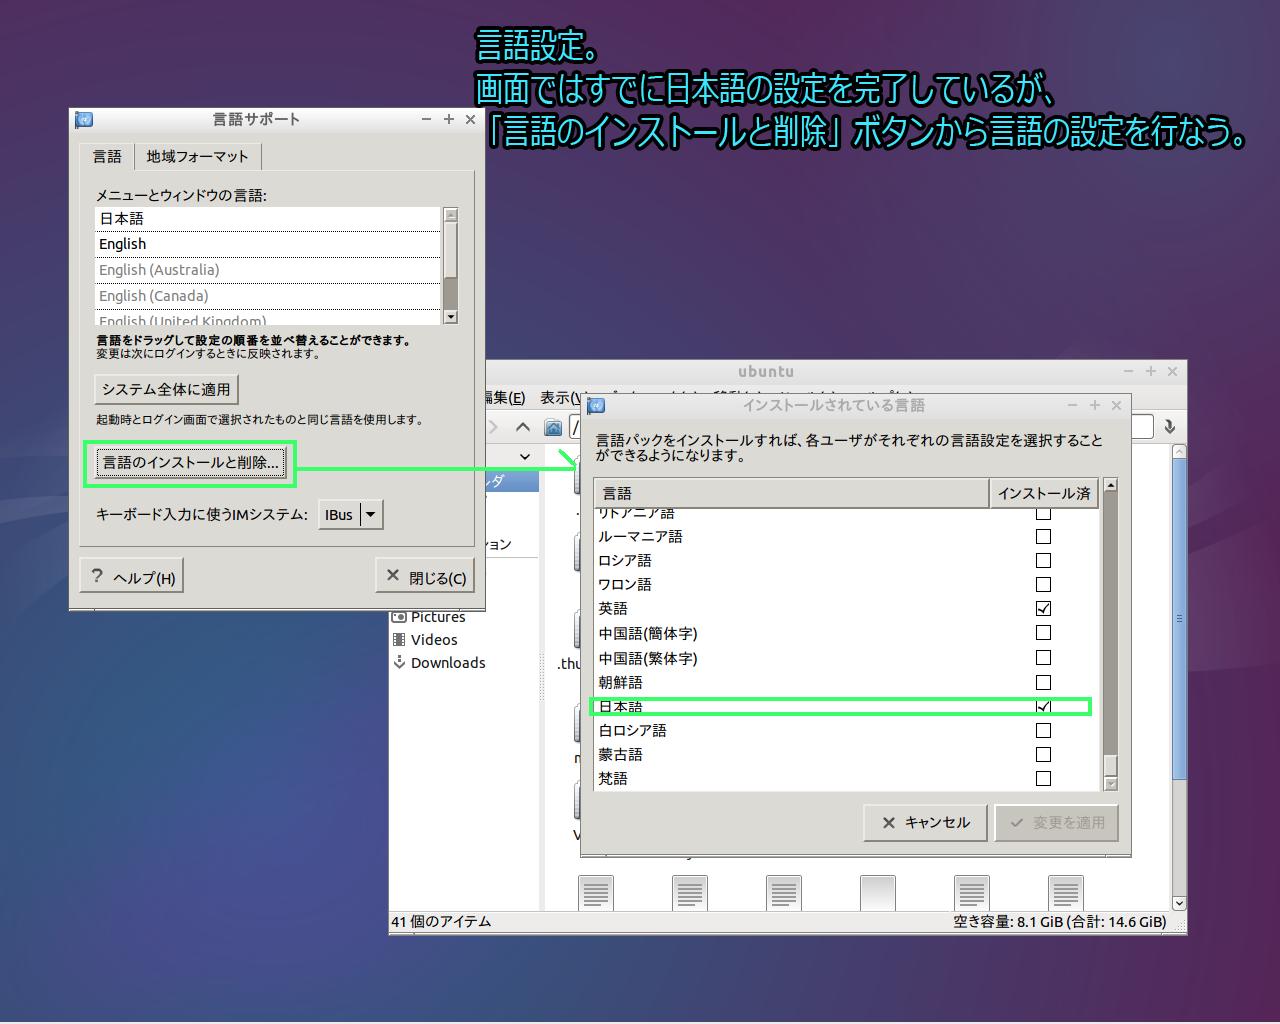 RaspberryPi2でUbuntuを動かす